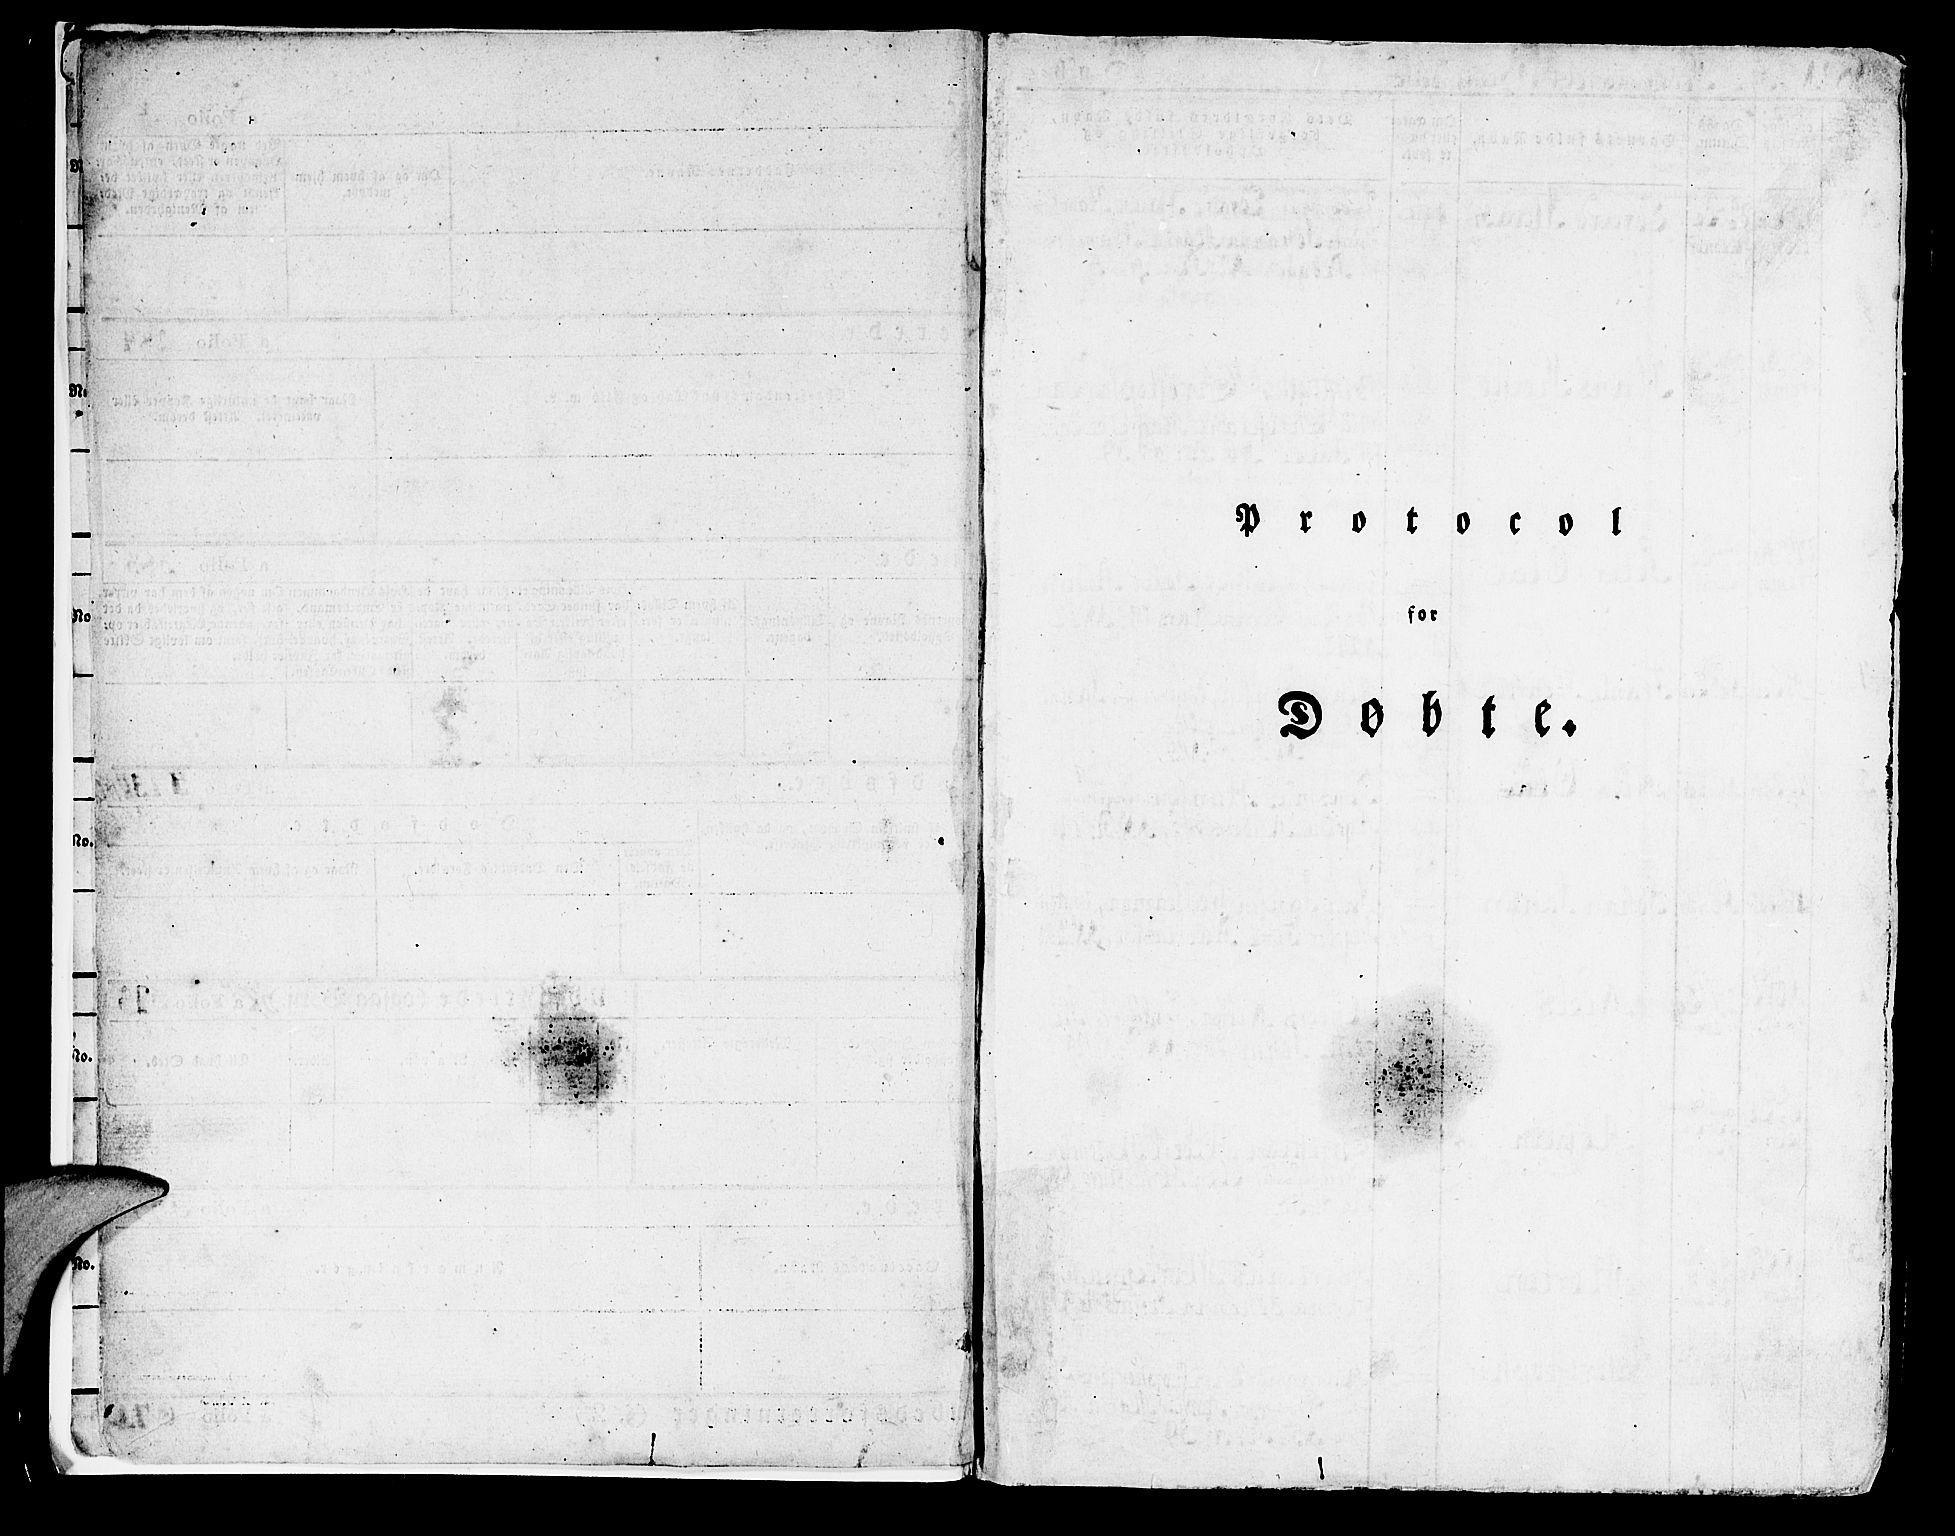 SAB, Domkirken Sokneprestembete, H/Haa/L0012: Ministerialbok nr. A 12, 1821-1840